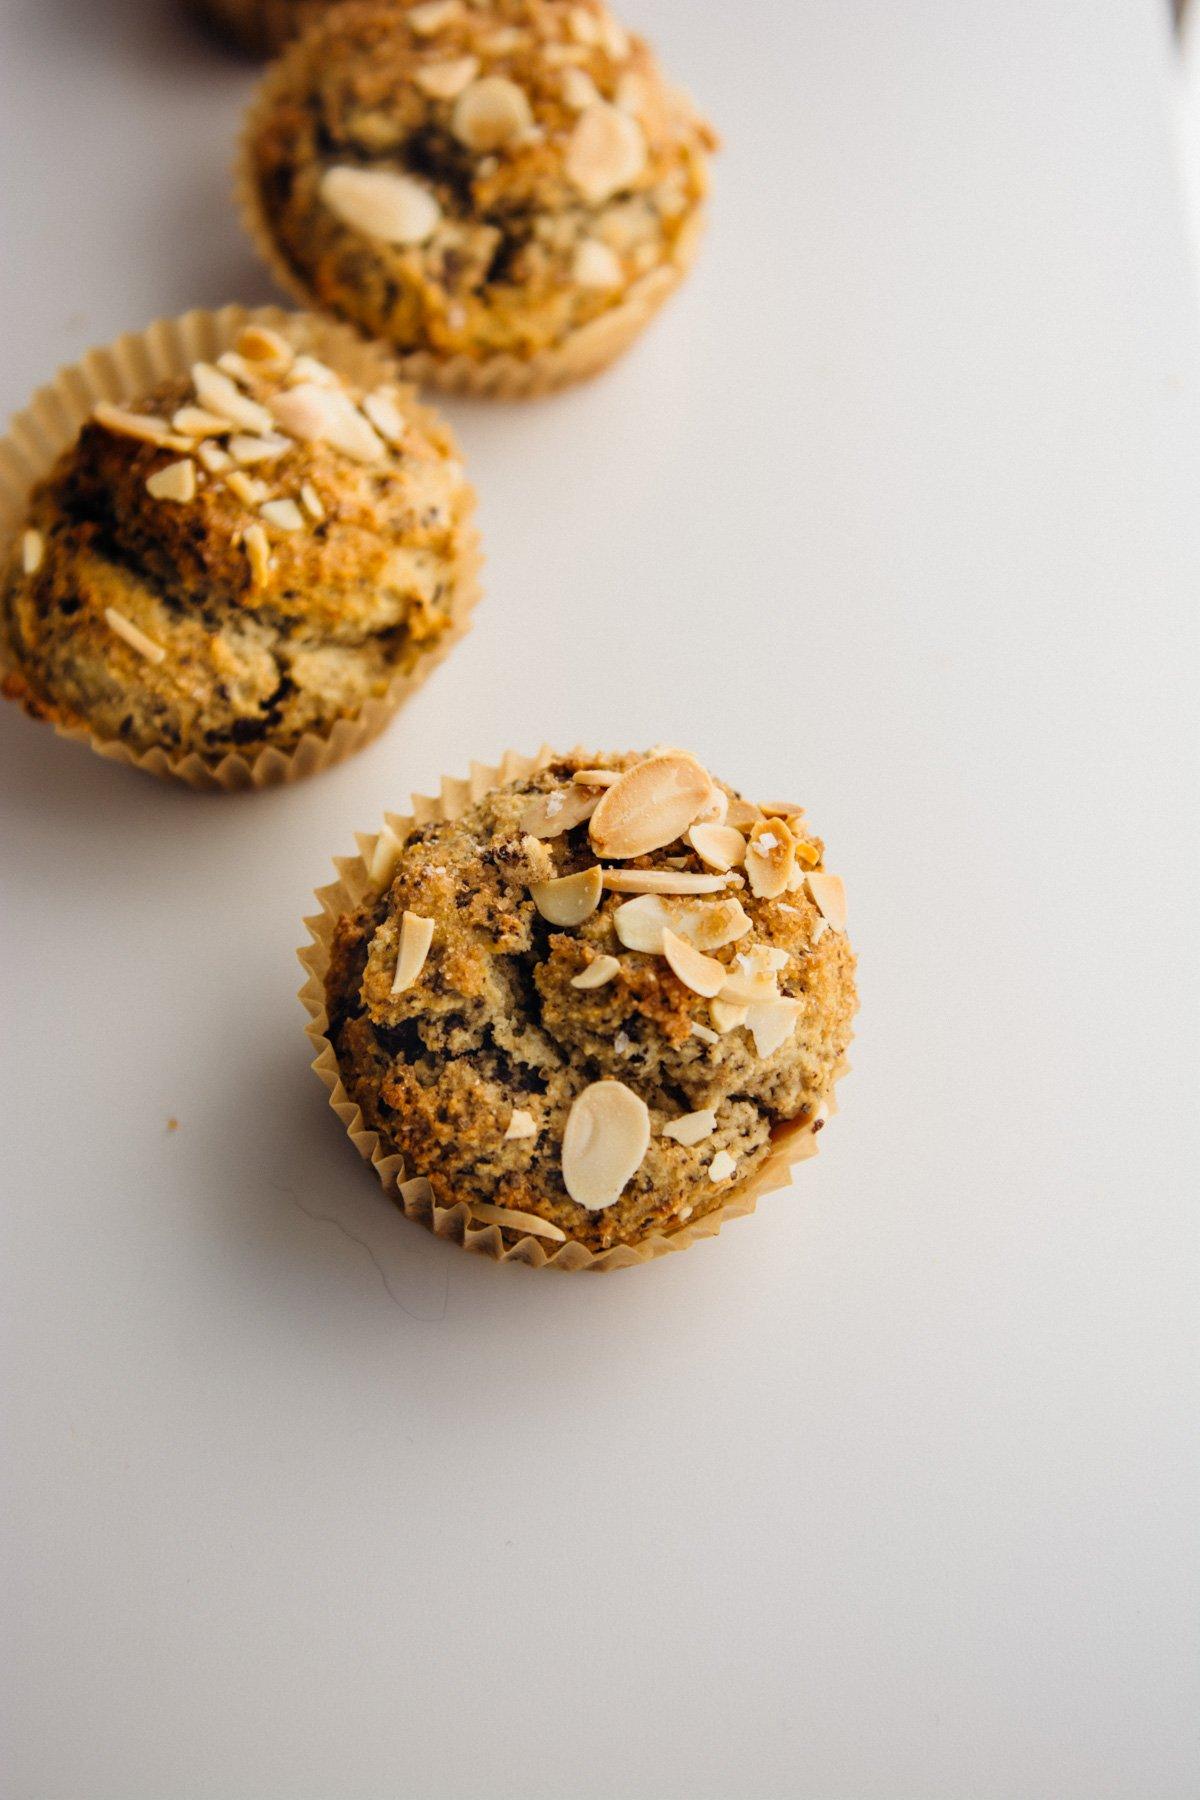 banana almond chocolate chip muffins (gluten- free + dairy-free) | scalingbackblog.com